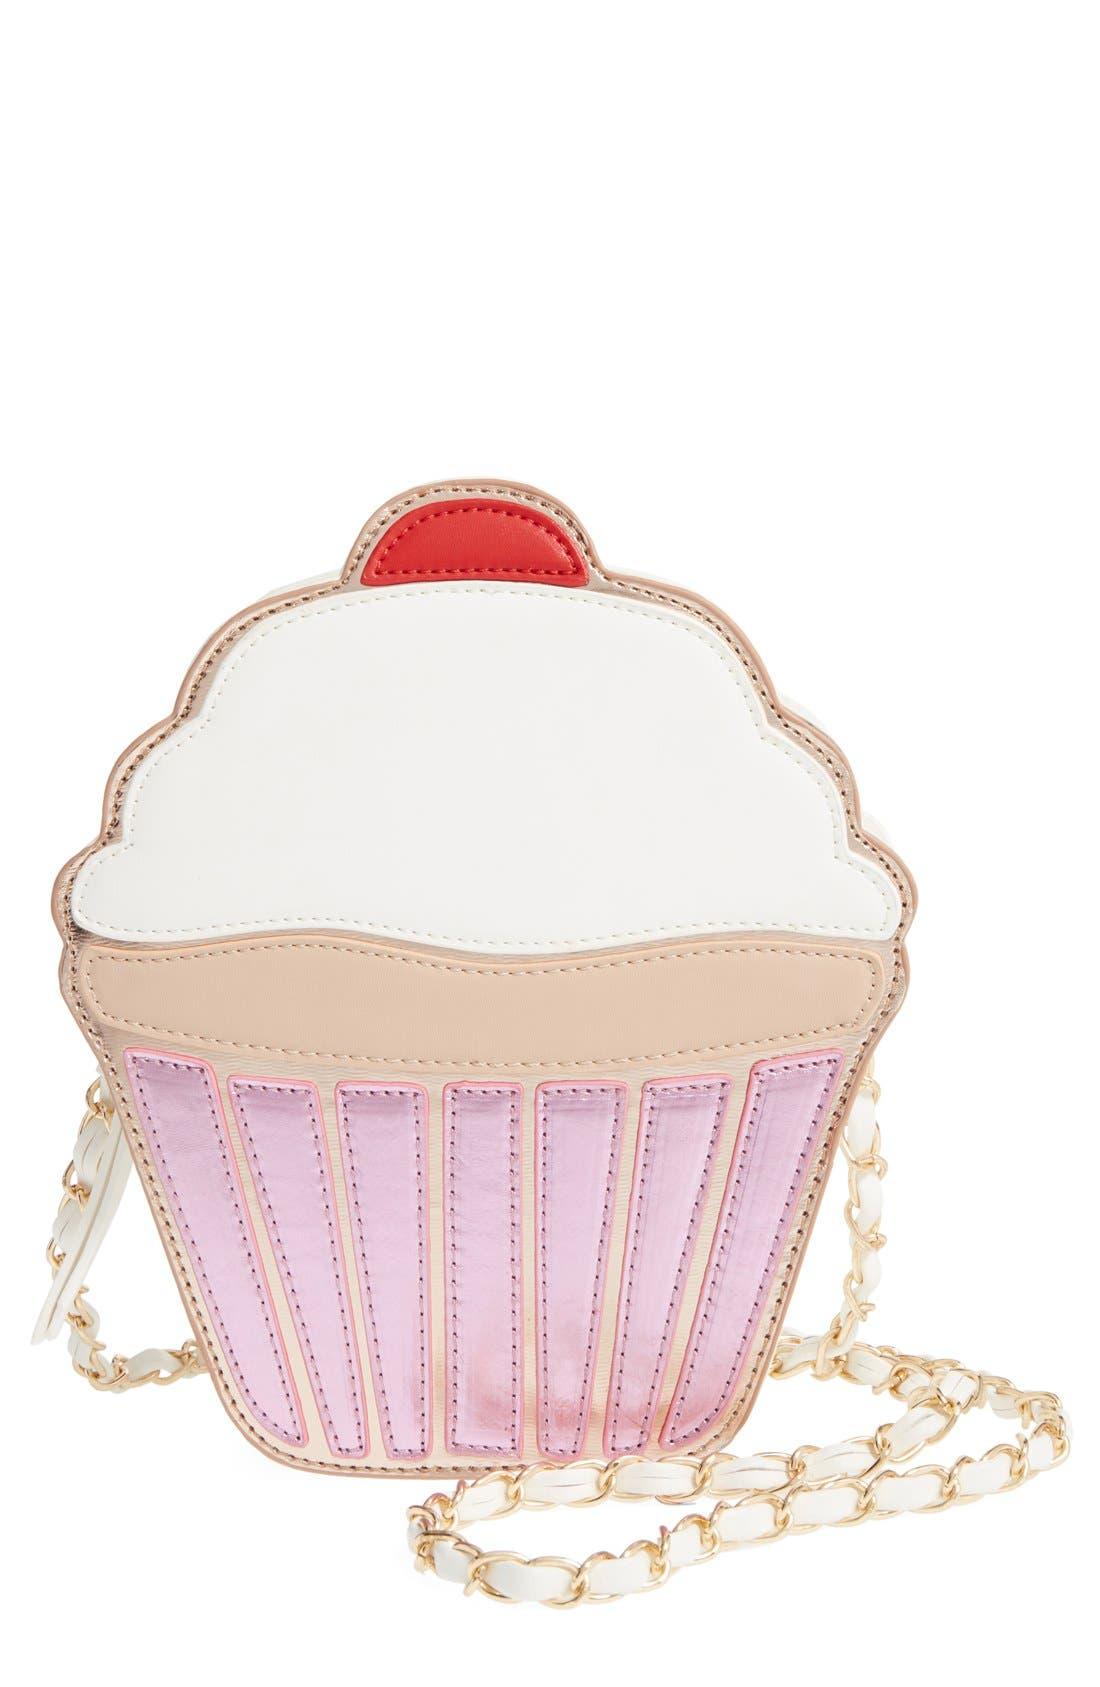 'Cupcake' Faux Leather Crossbody Bag, Main, color, 650